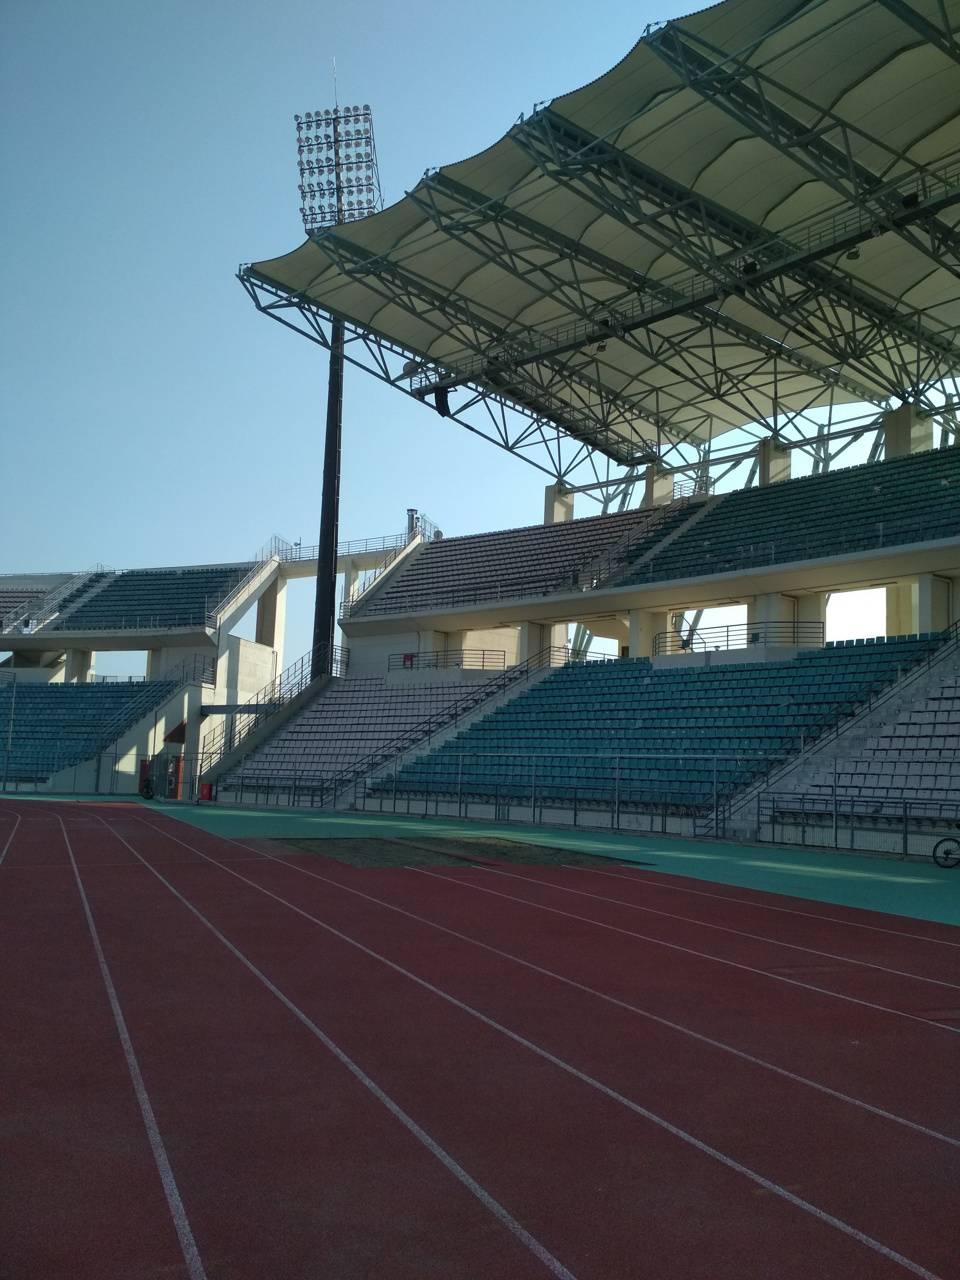 Glory stadium